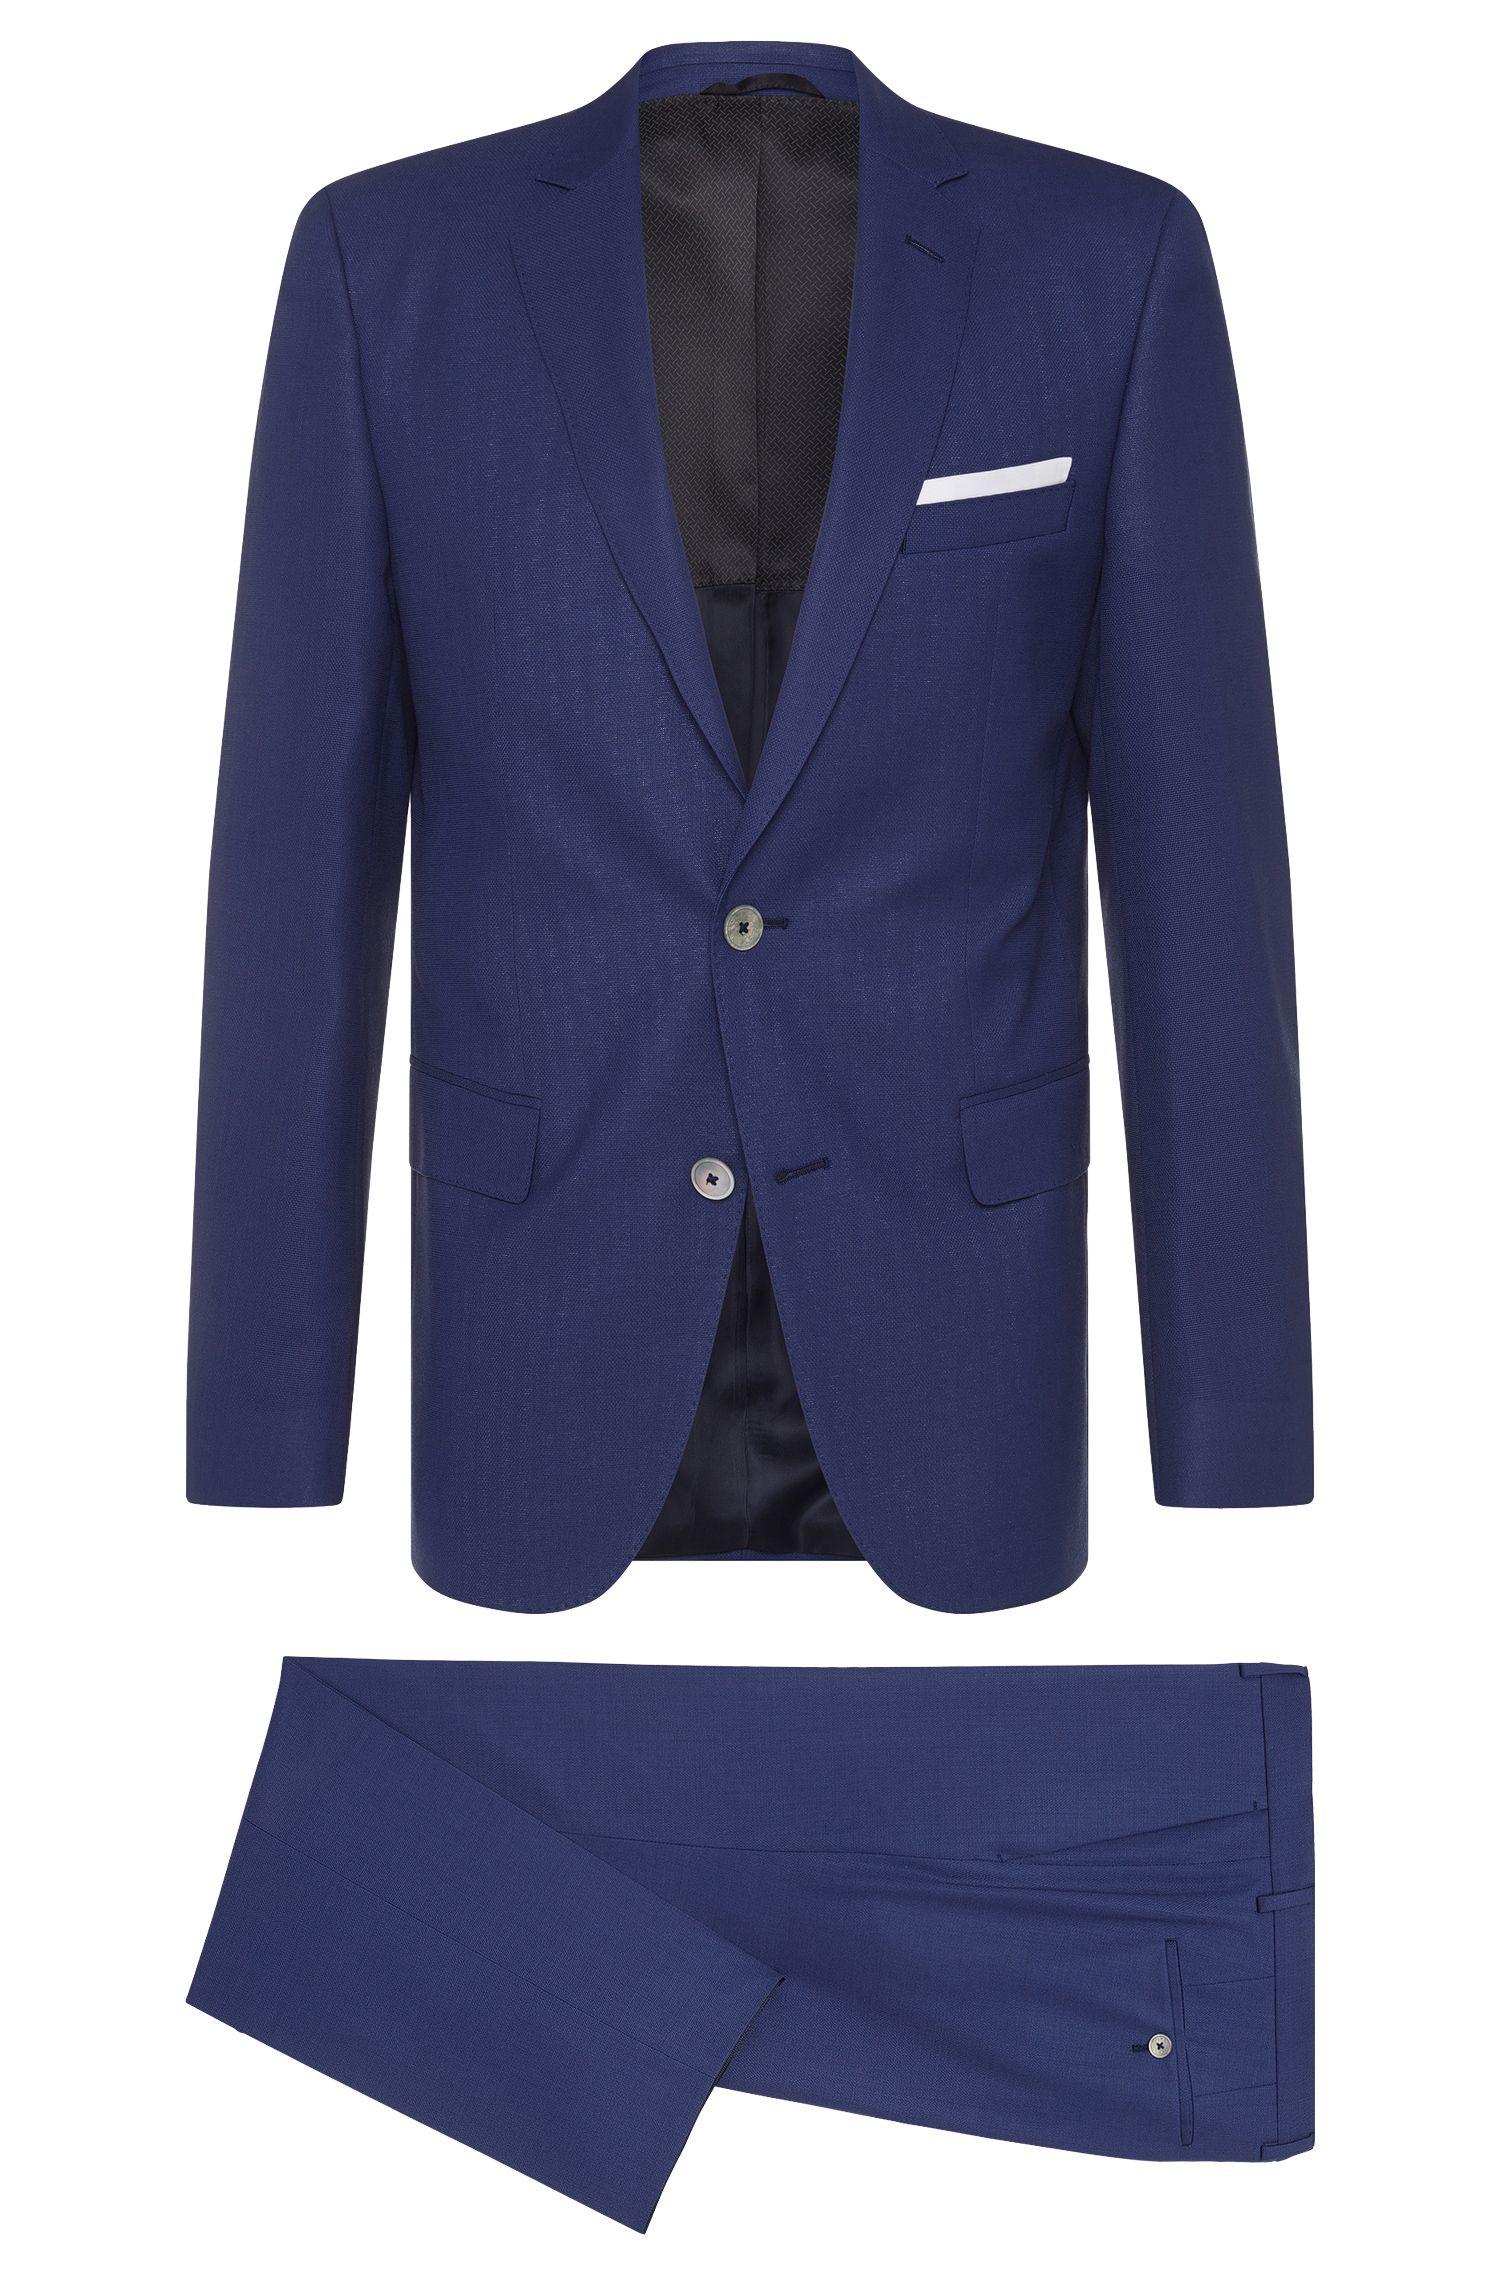 'Hutson/Gander' | Slim Fit, Italian Super 130 Virgin Wool Suit